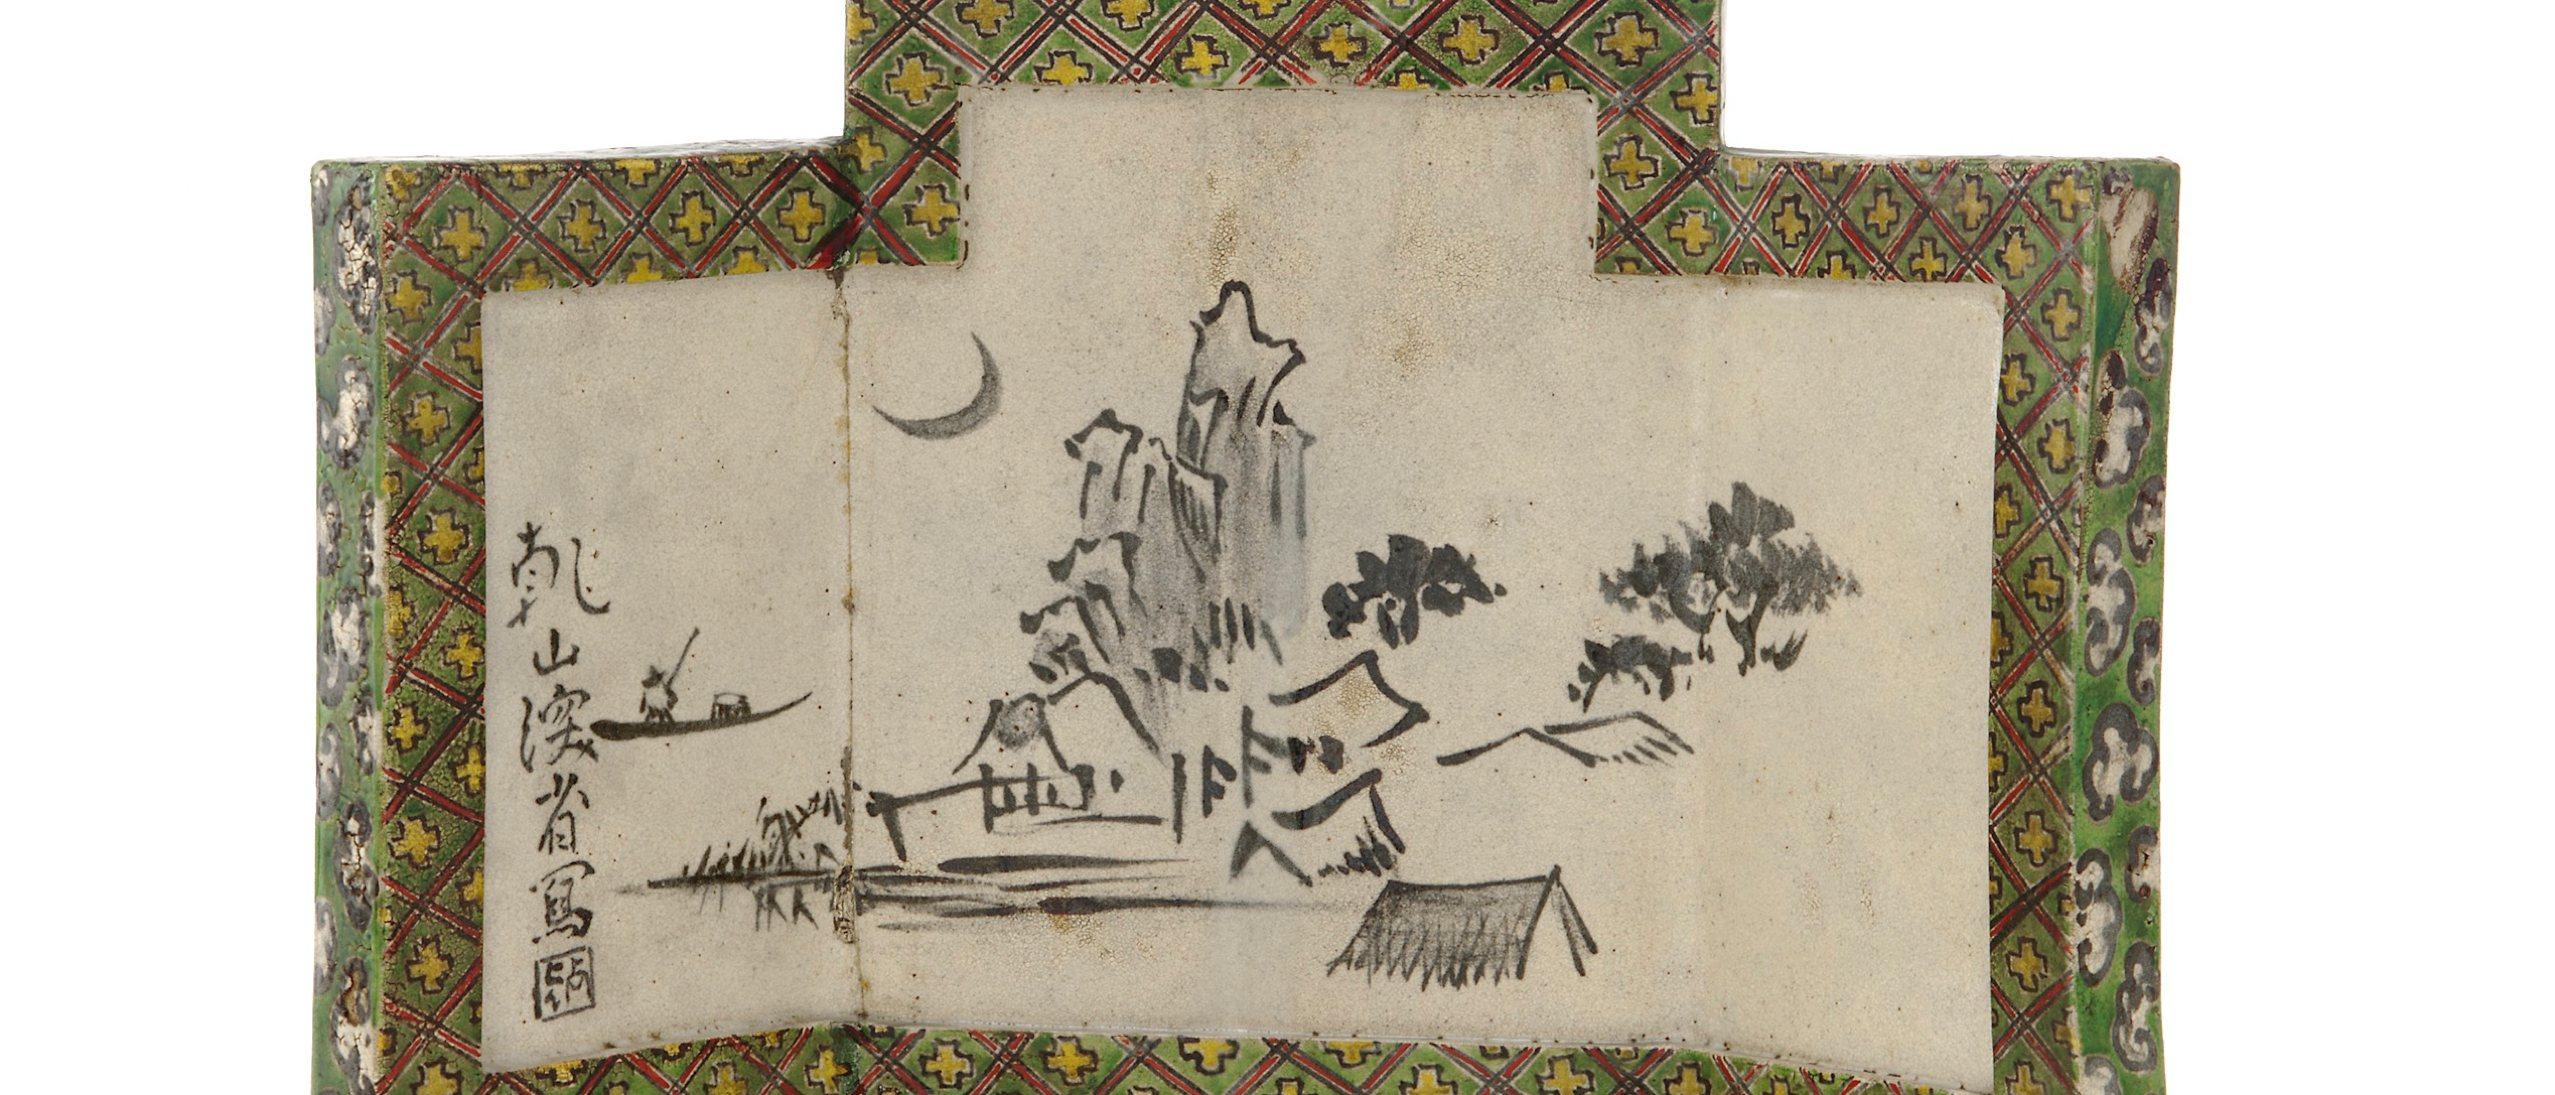 Kenzan style desk screen with design of mountain retreat